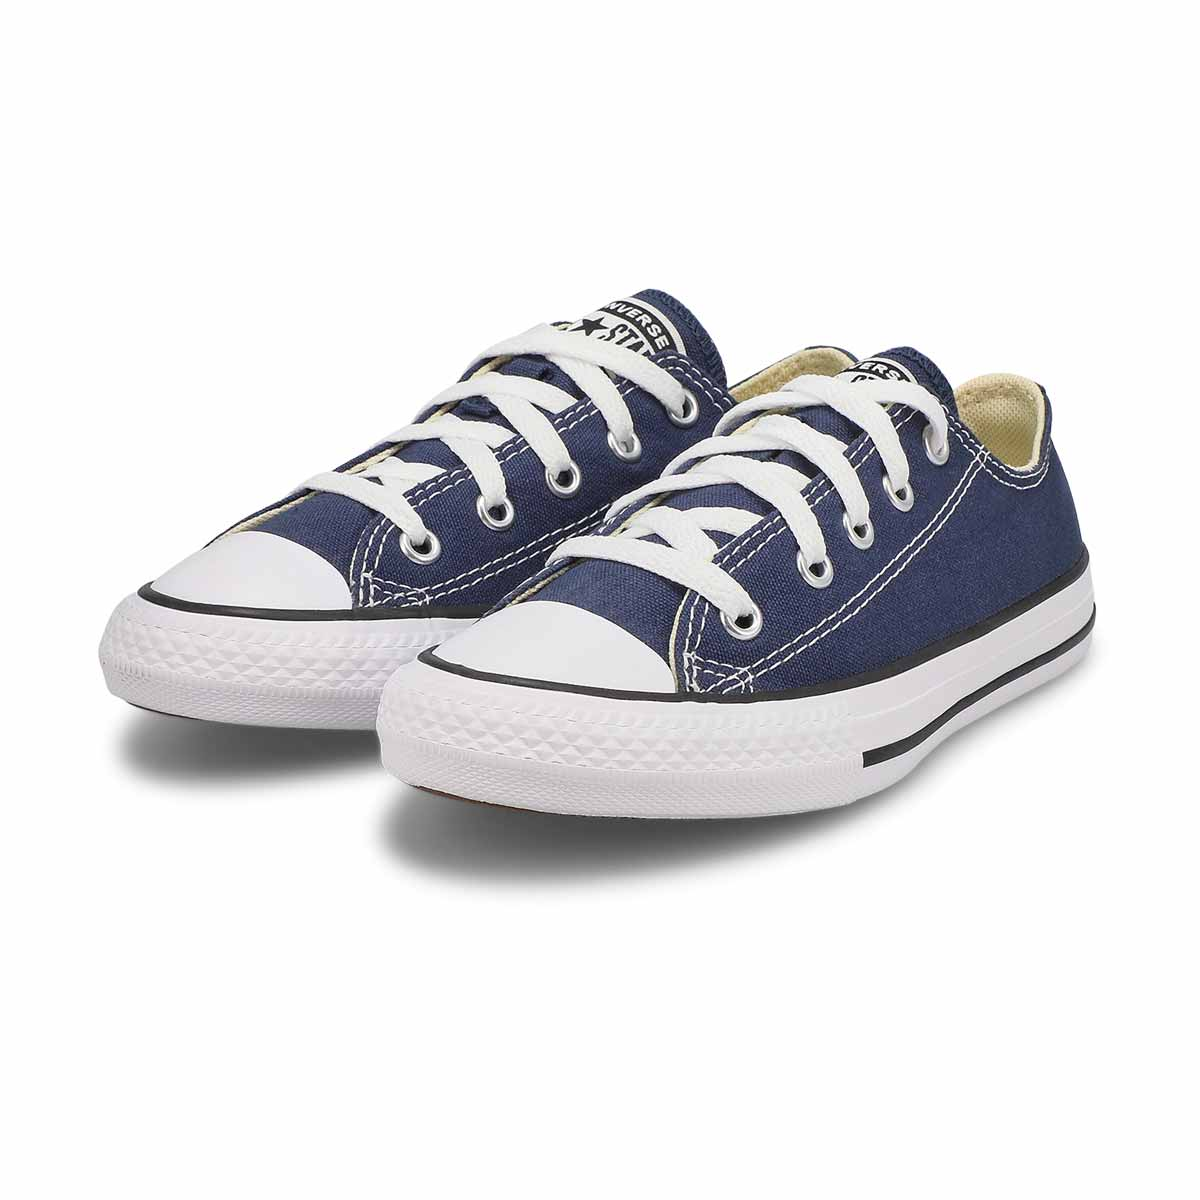 Kids' Chuck Taylor All Star Sneaker - Navy